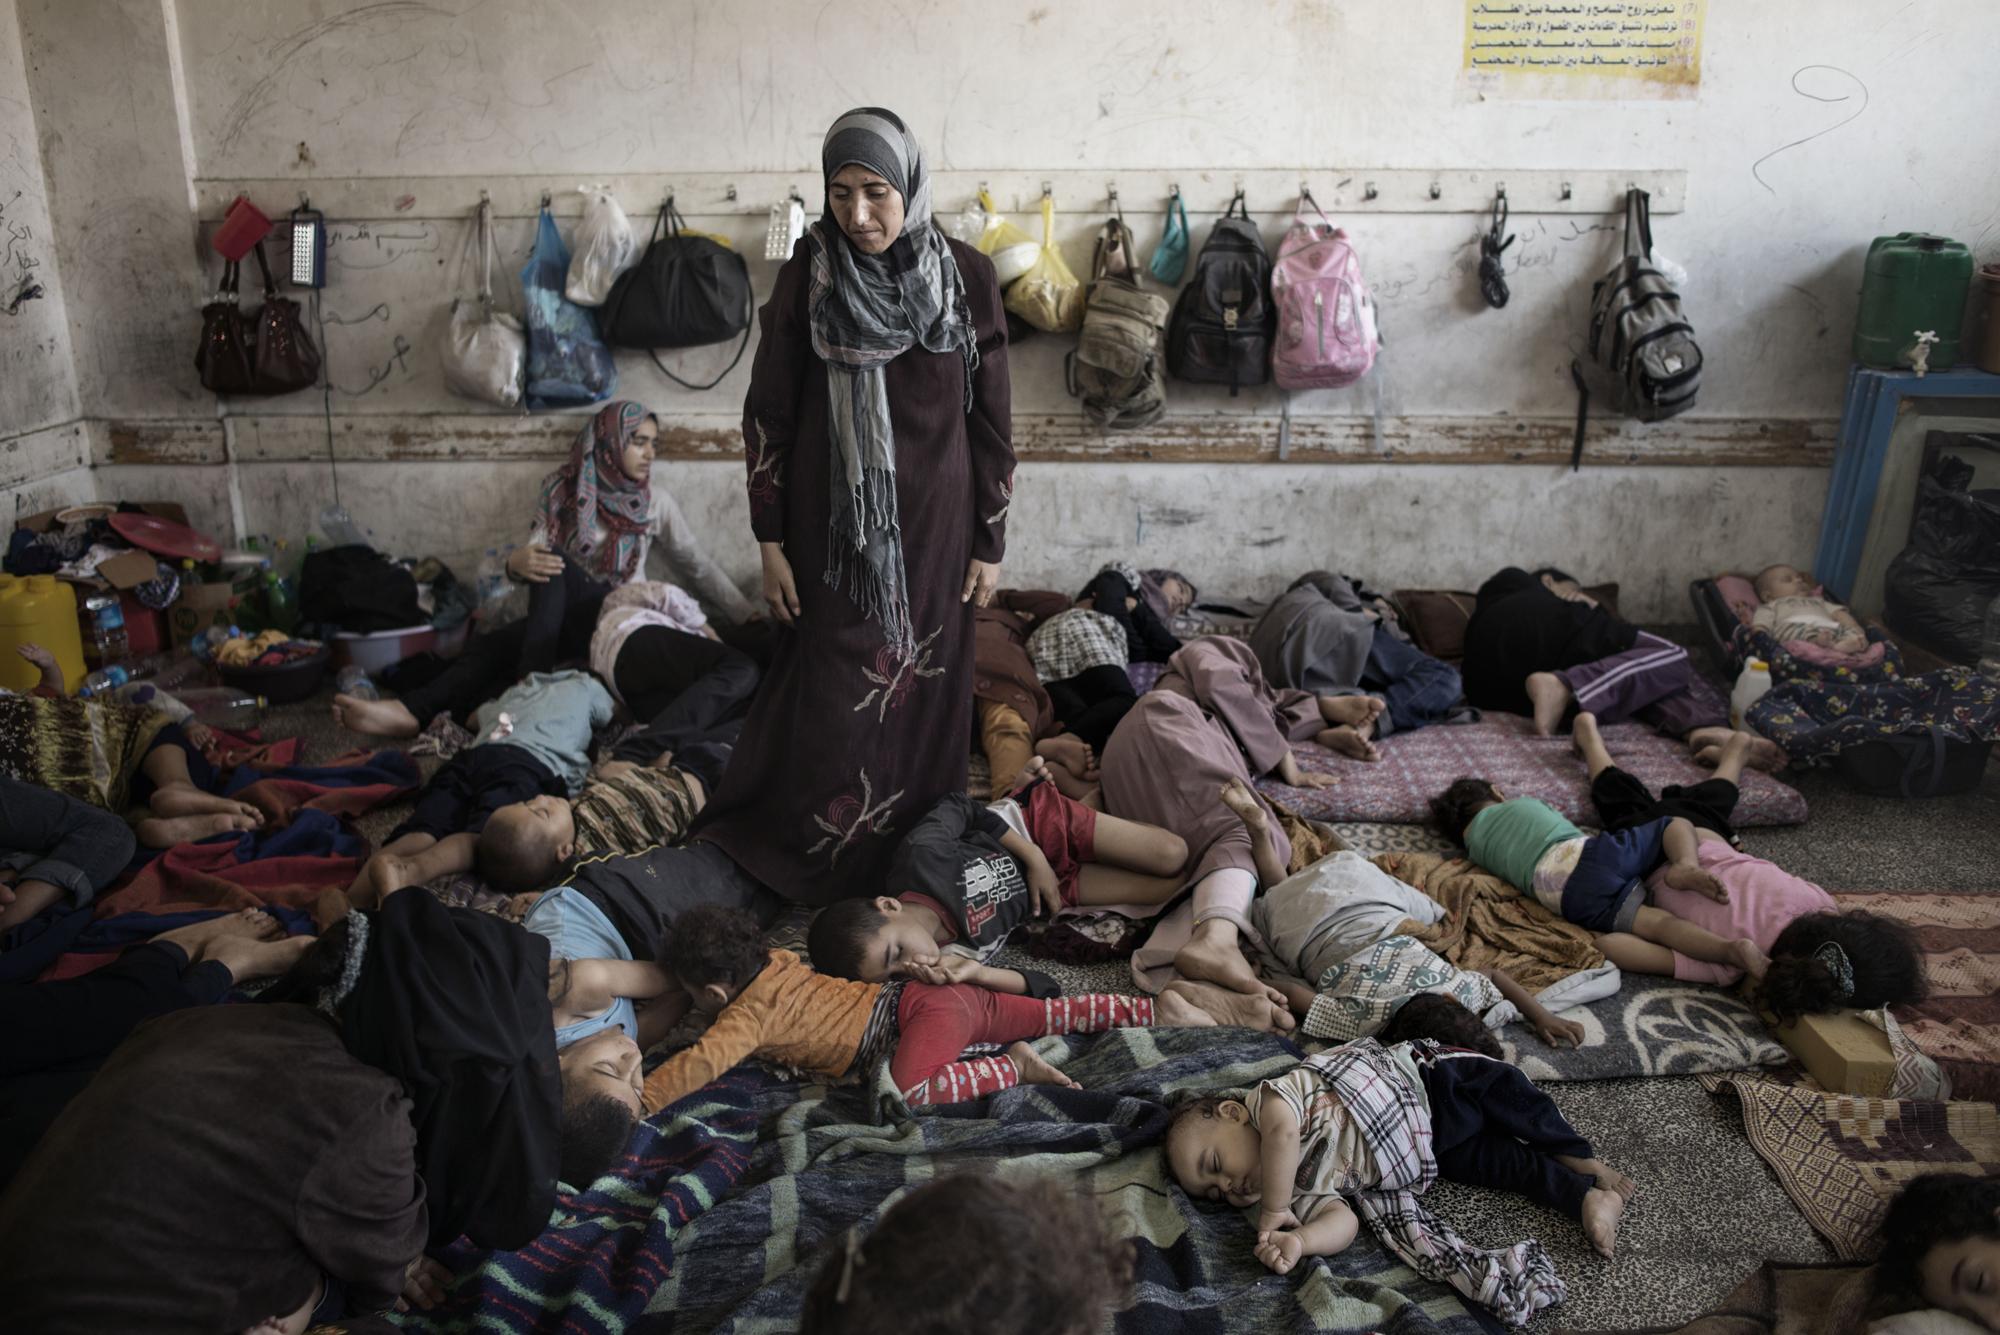 Displaced Palestinians from Beit Hanoun sleep inside the UNRWA school in Jabalia, July 23, 2014.